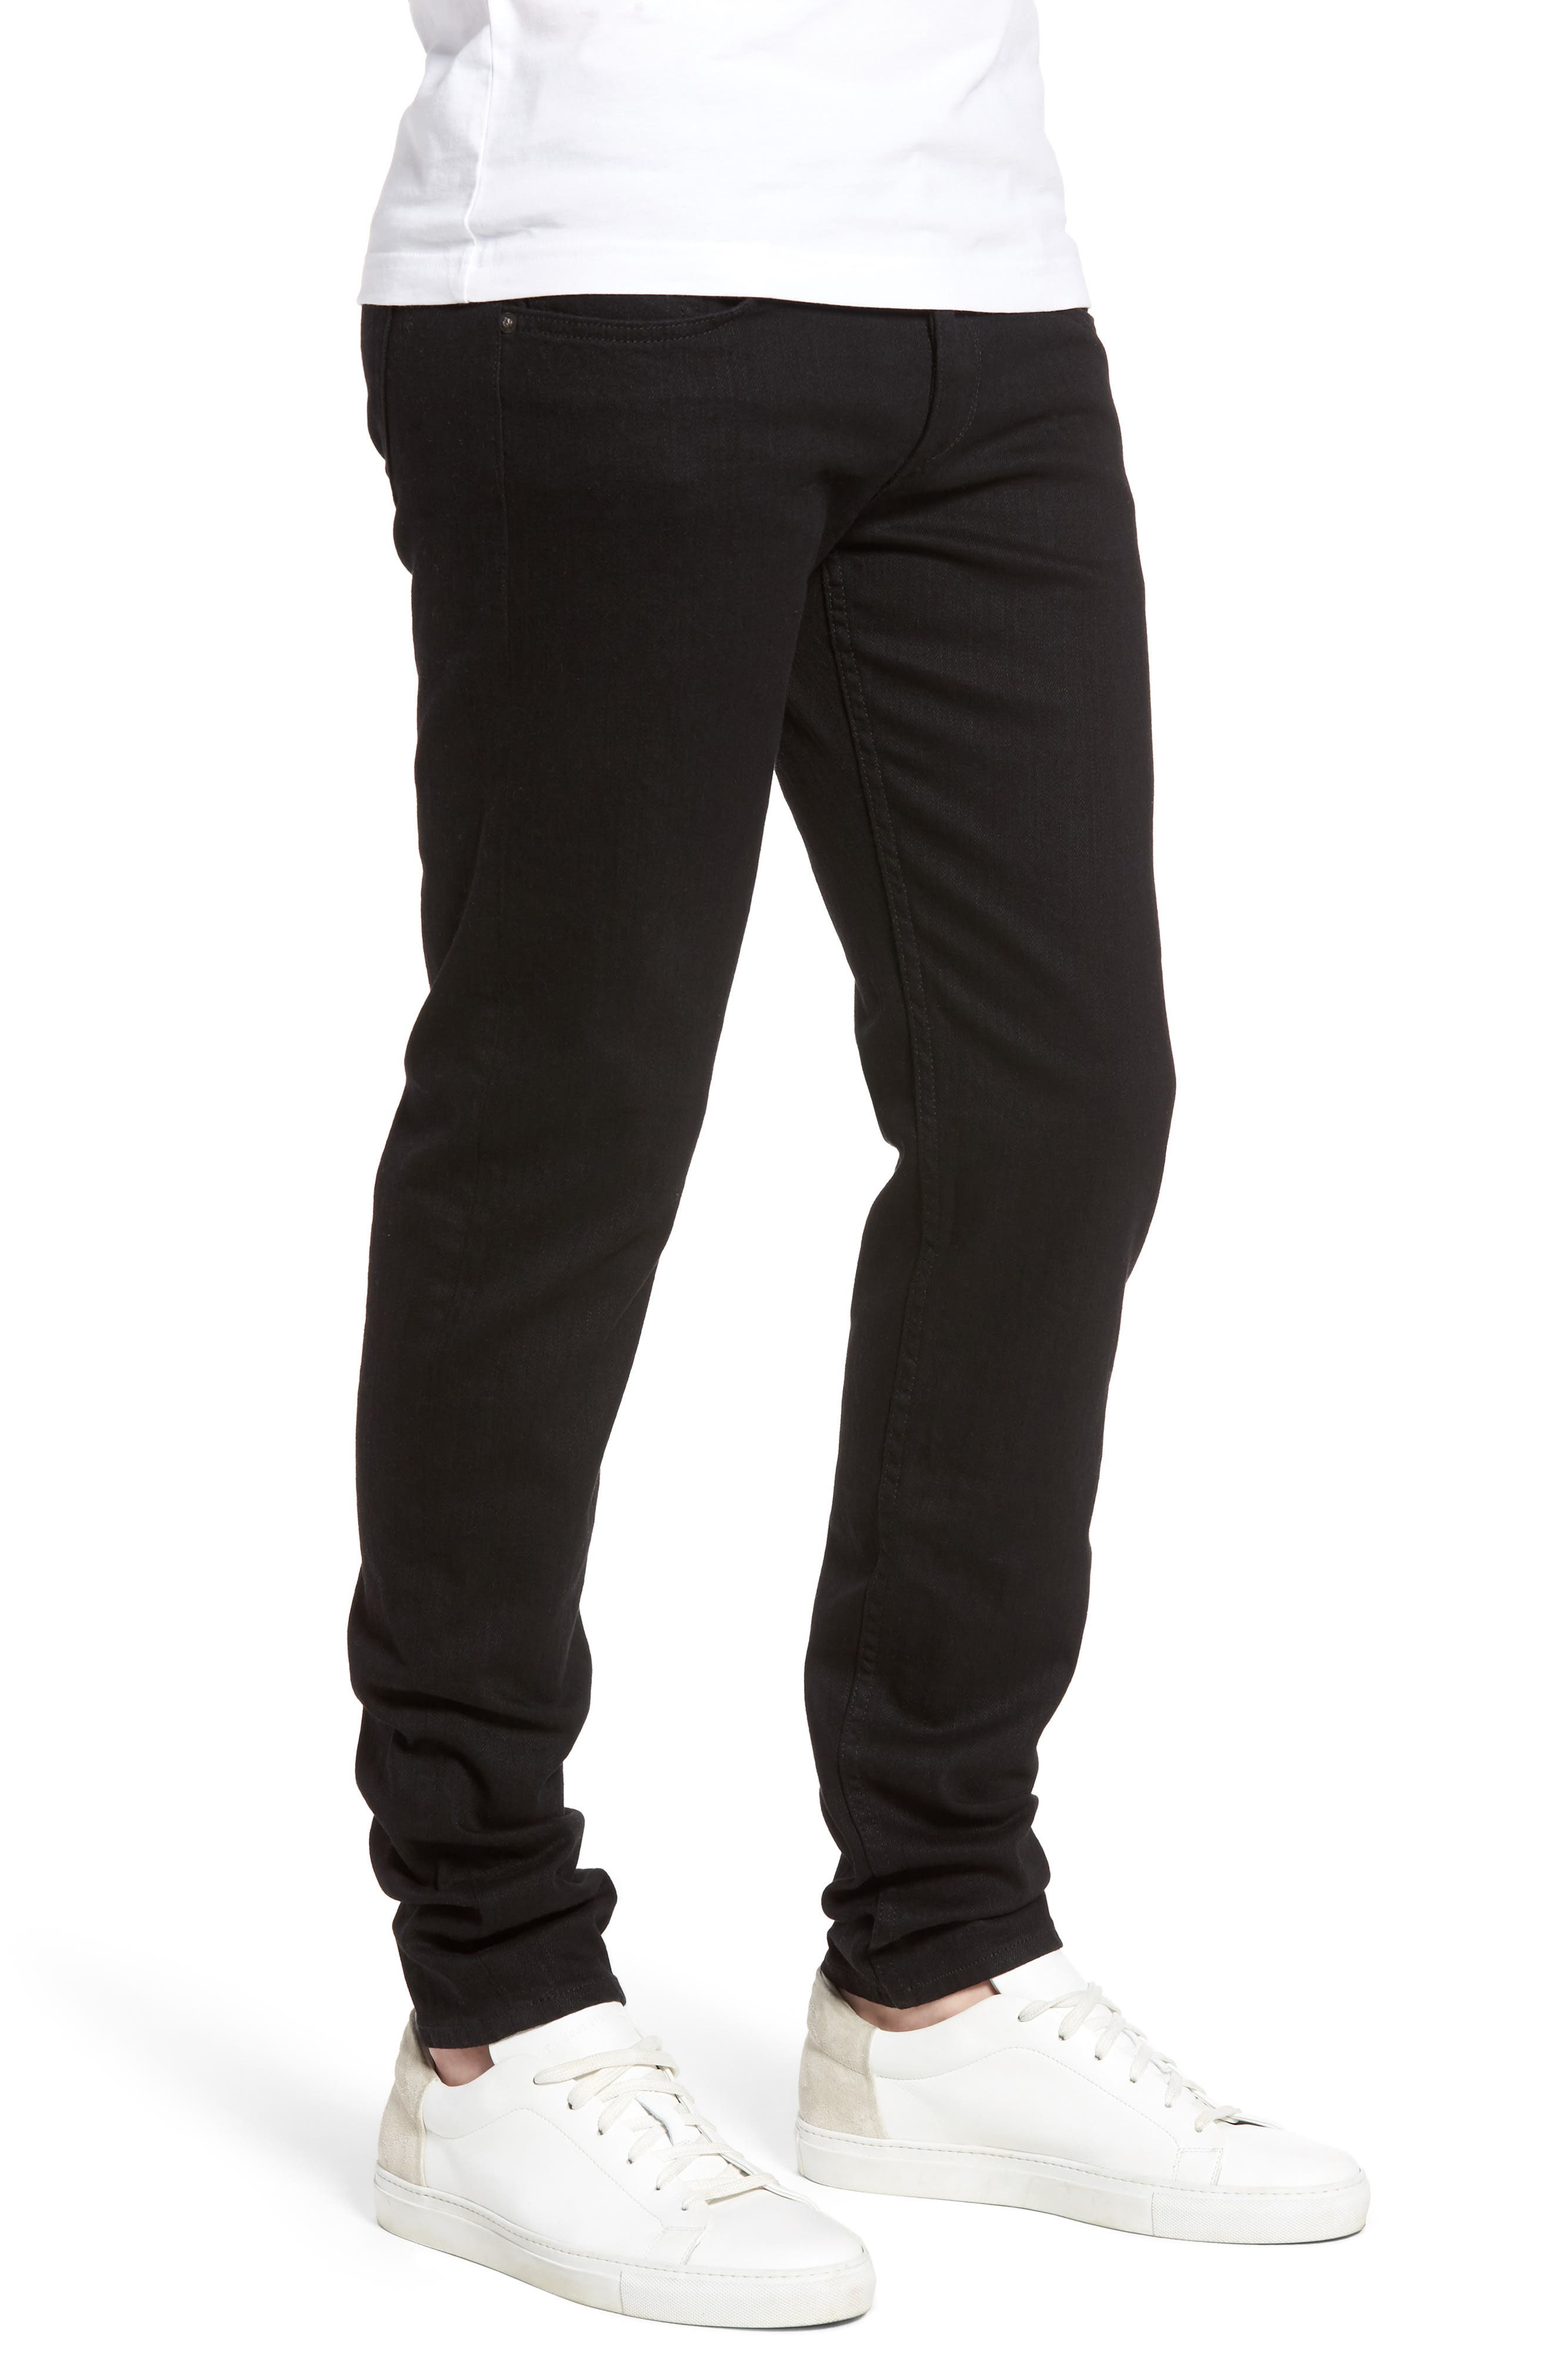 Alternate Image 3  - rag & bone Standard Issue Fit 1 Skinny Fit Jeans